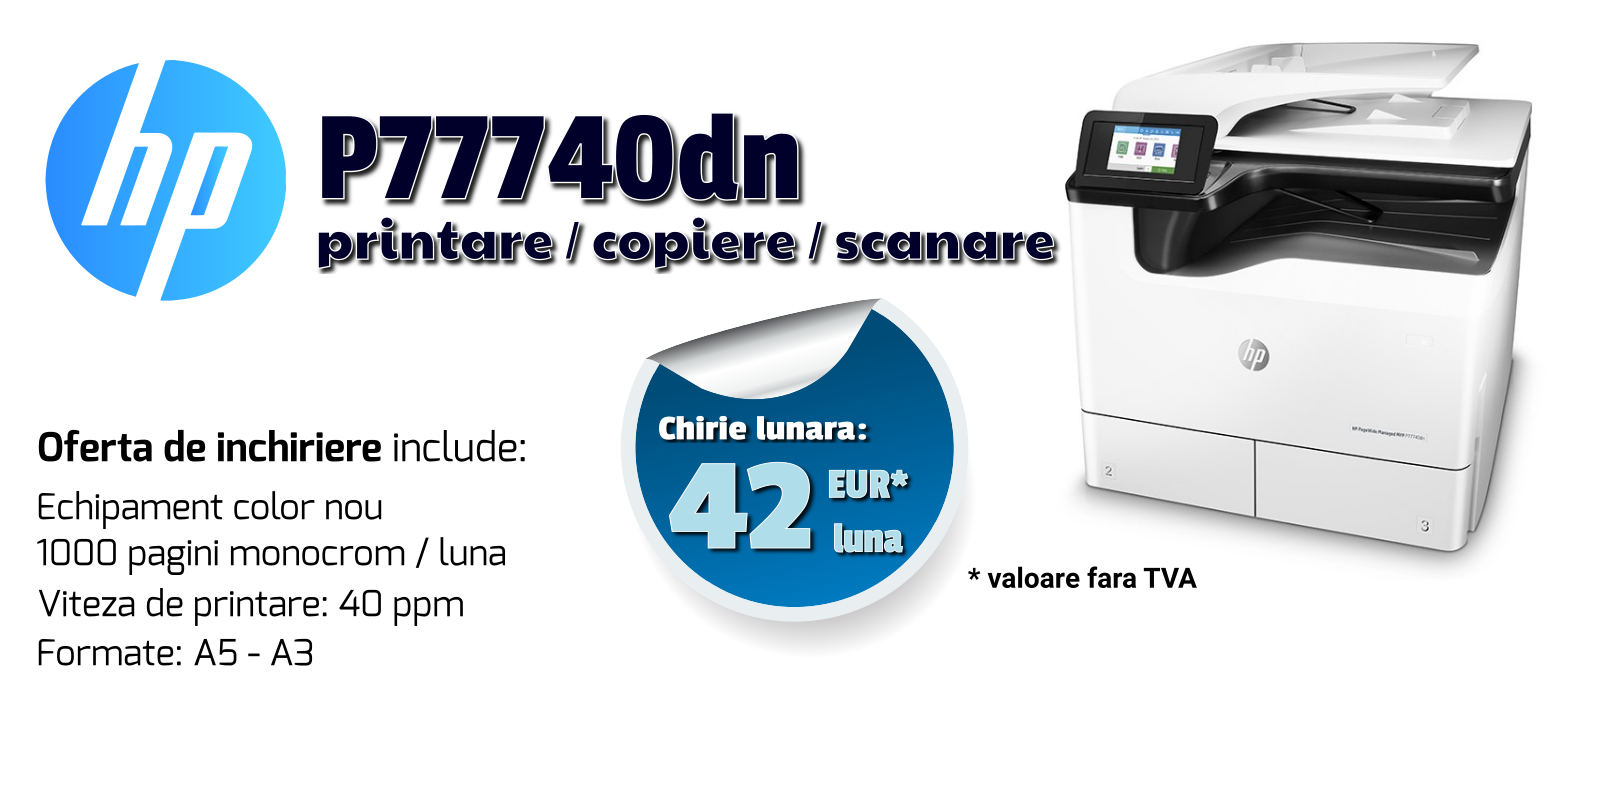 Promotii inchiriere echipamente de printare, imprimante laser si multifunctionale prin Romsystem.ro - HP P77740dn